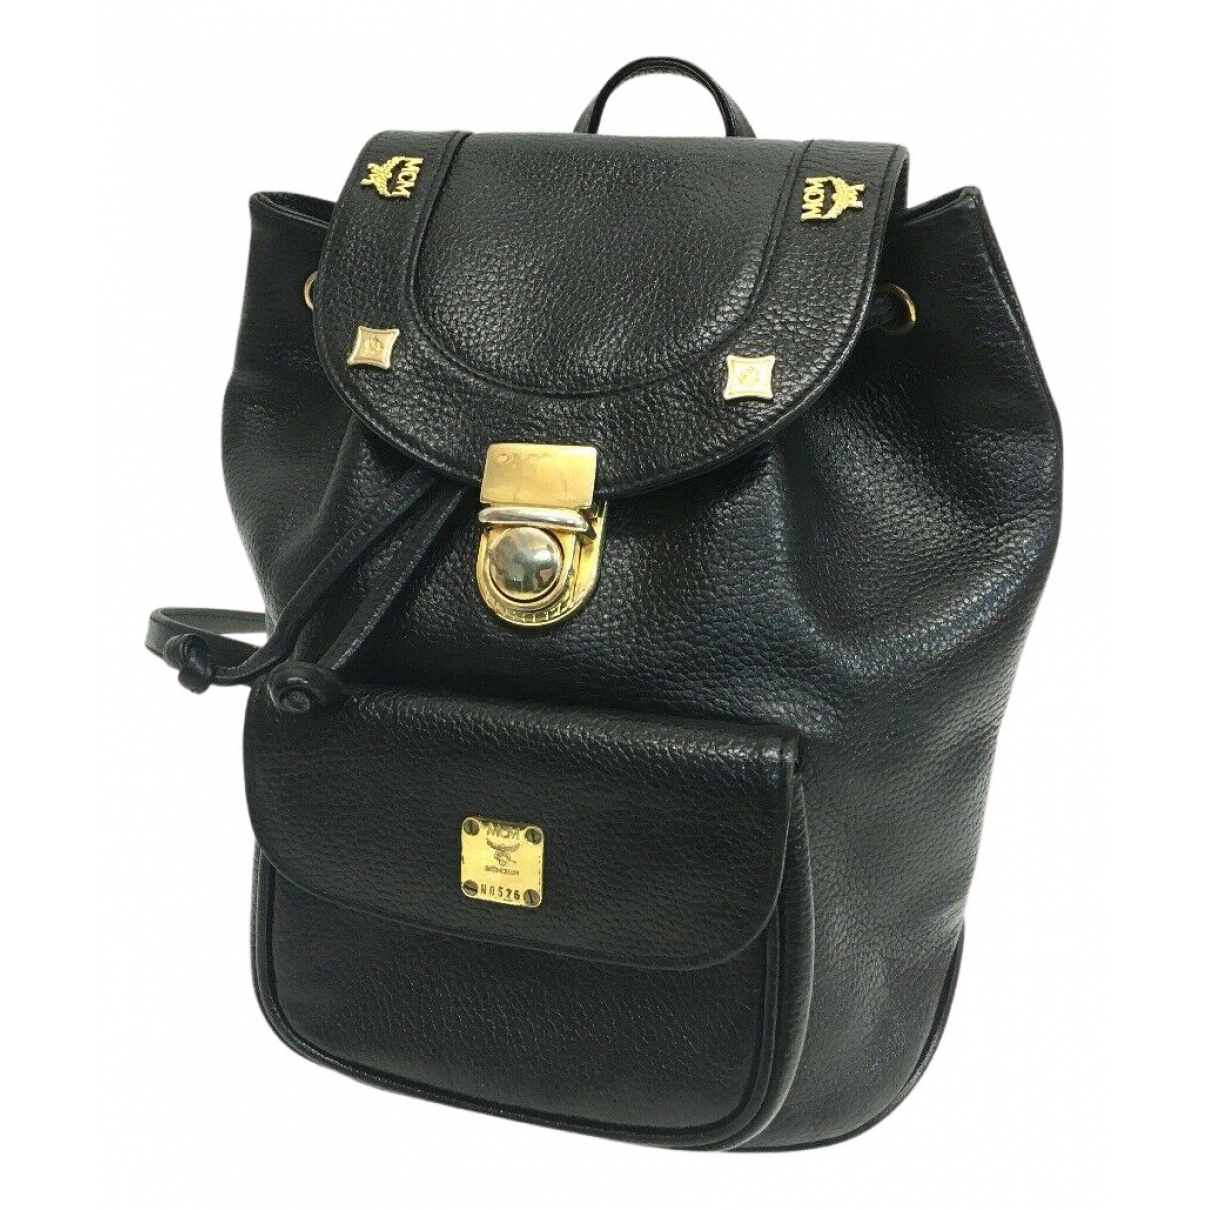 Mcm N Black Leather backpack for Women N